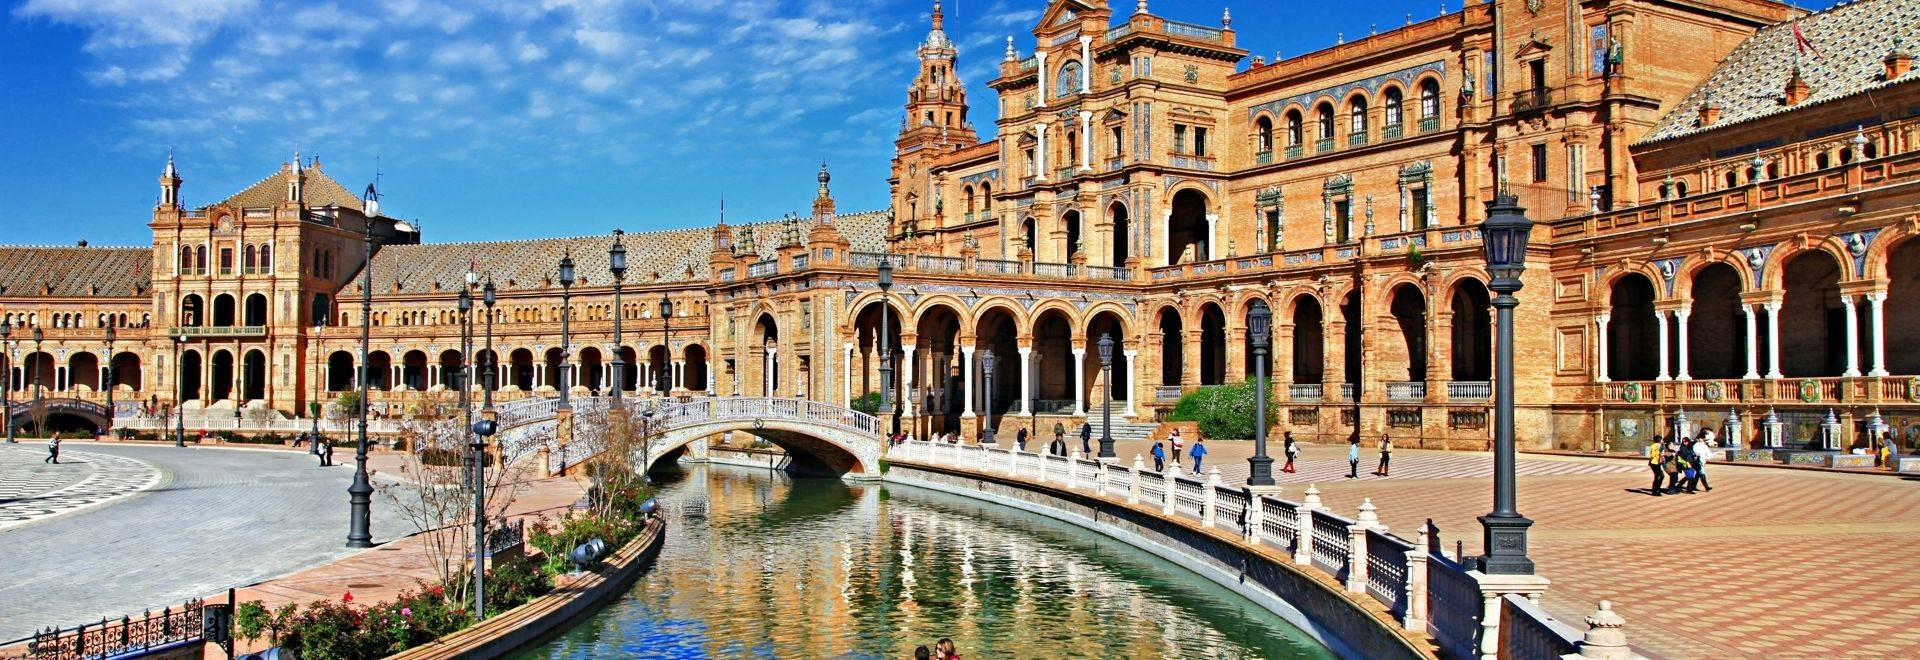 Shutterstock 179024282 Plaza De Espana, Seville